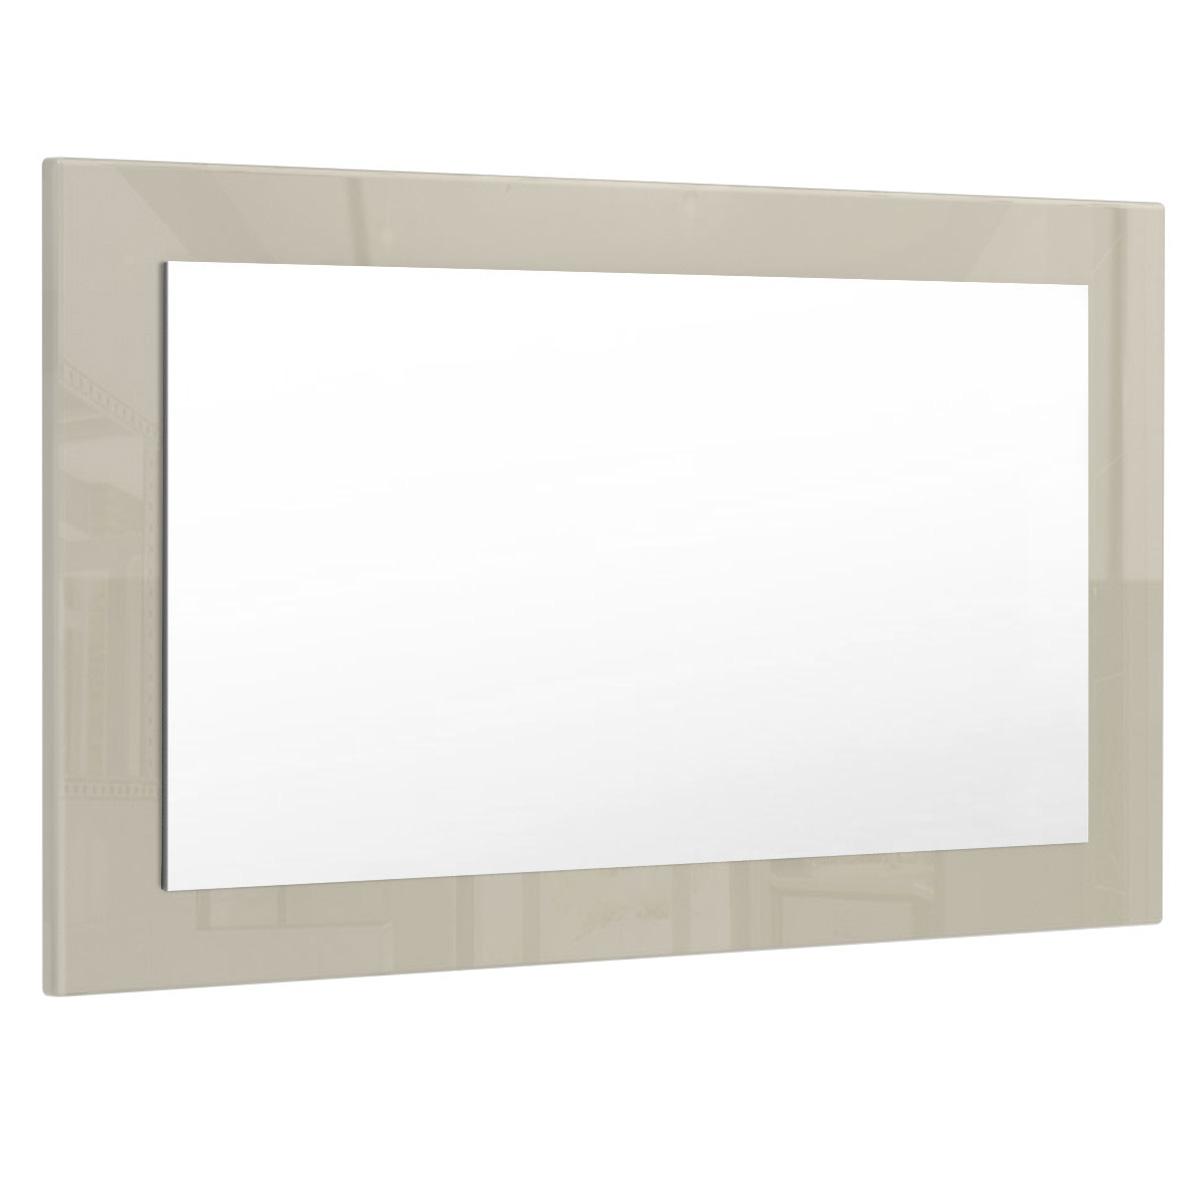 Miroir mural lima en 3 tailles et 16 coloris ebay for Miroir mural grande taille